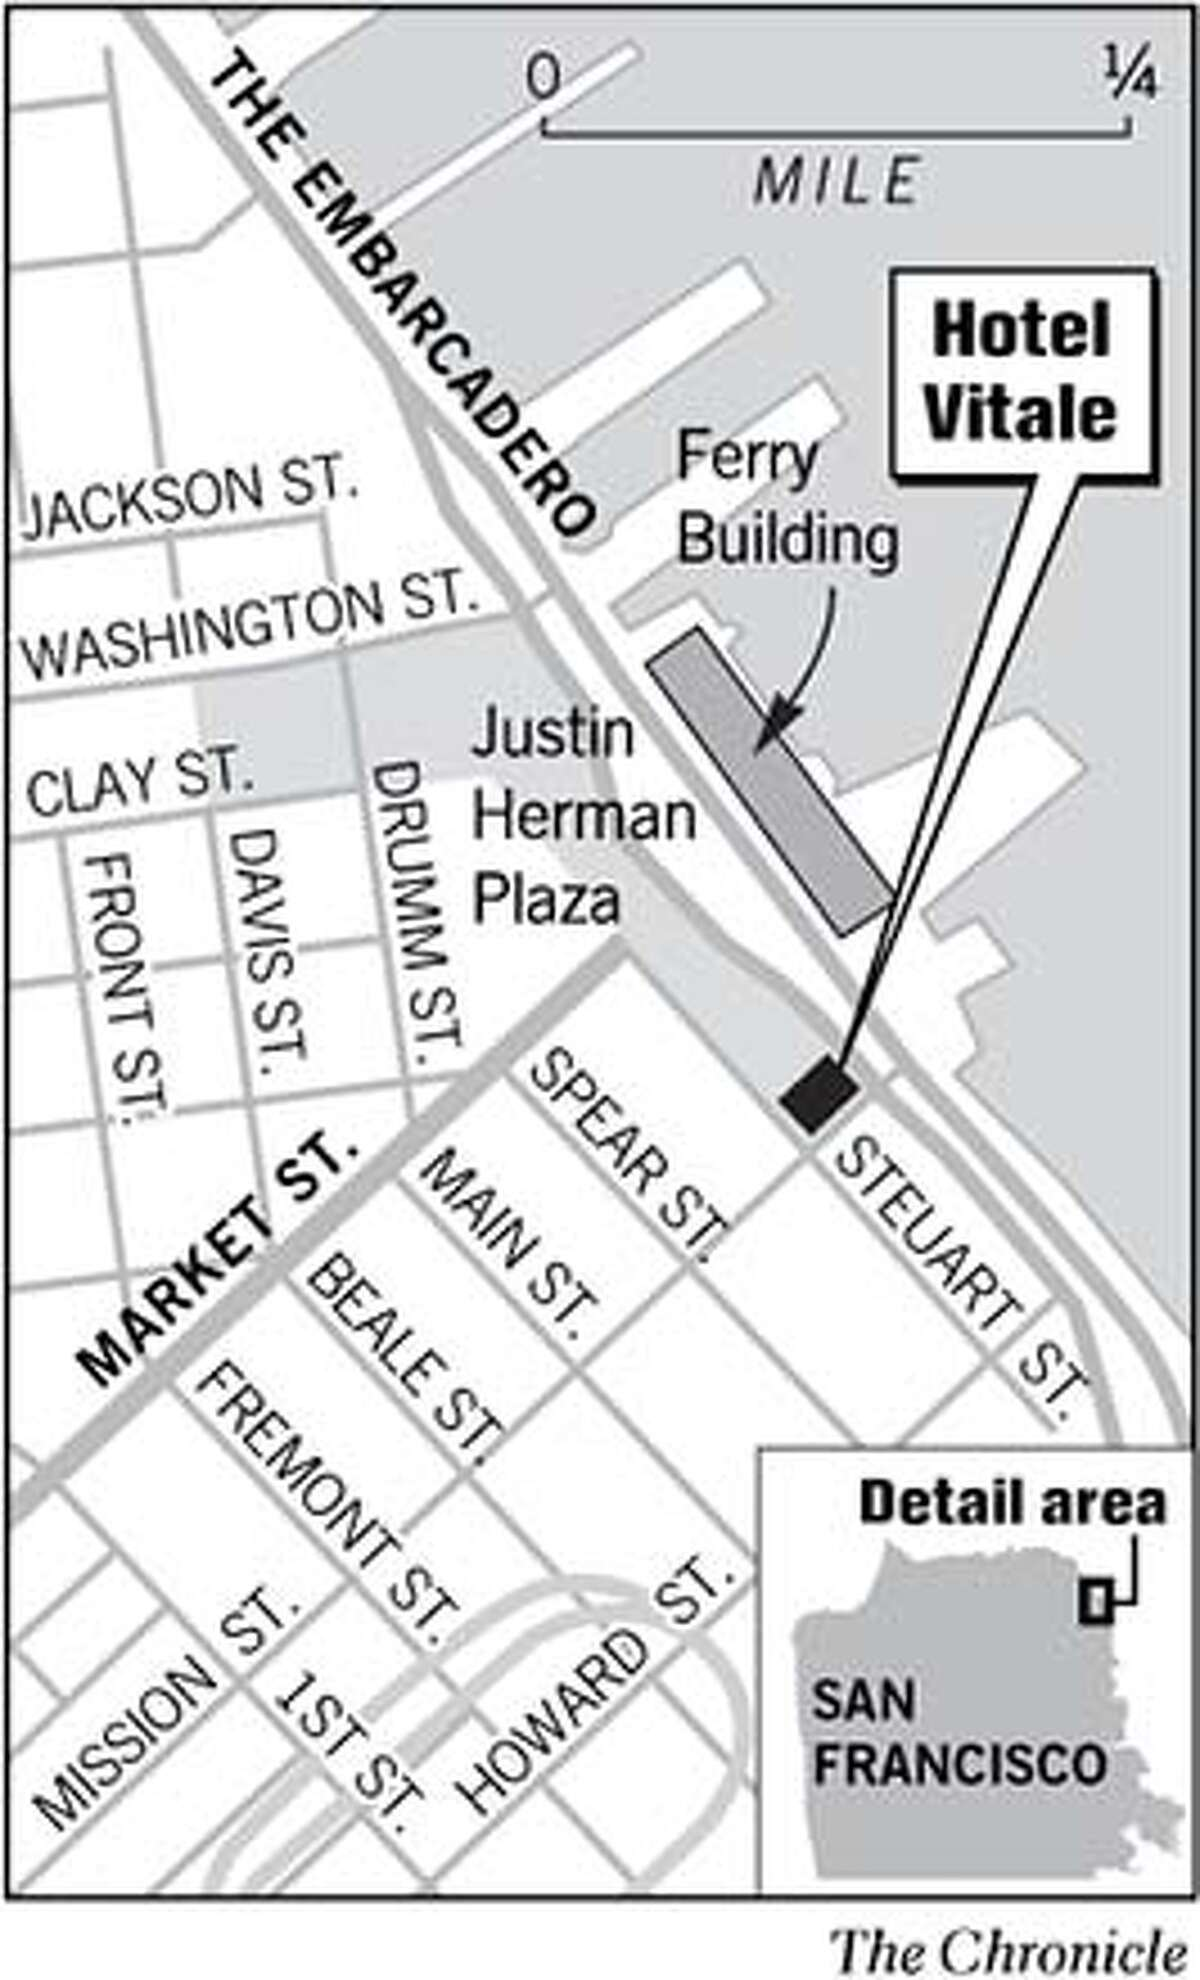 Hotel Vitale. Chronicle Graphic